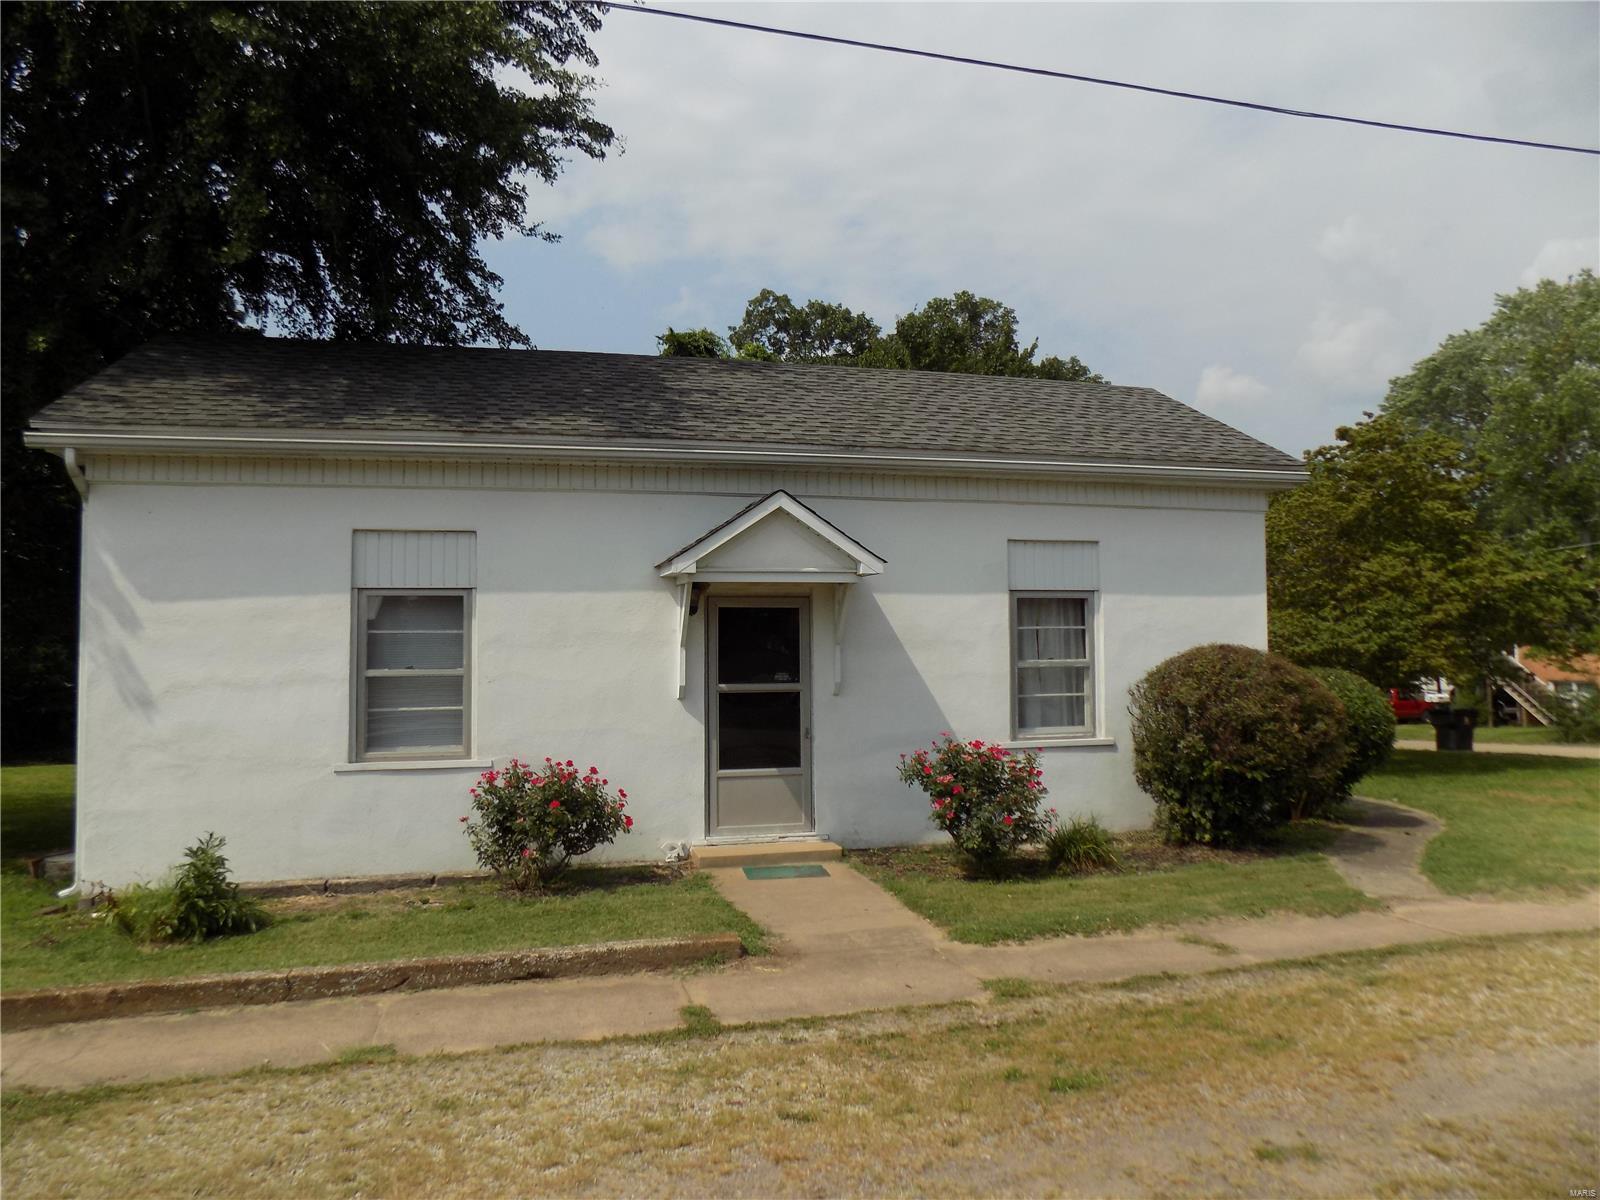 Residential for sale – 202  Knob   Ironton, MO